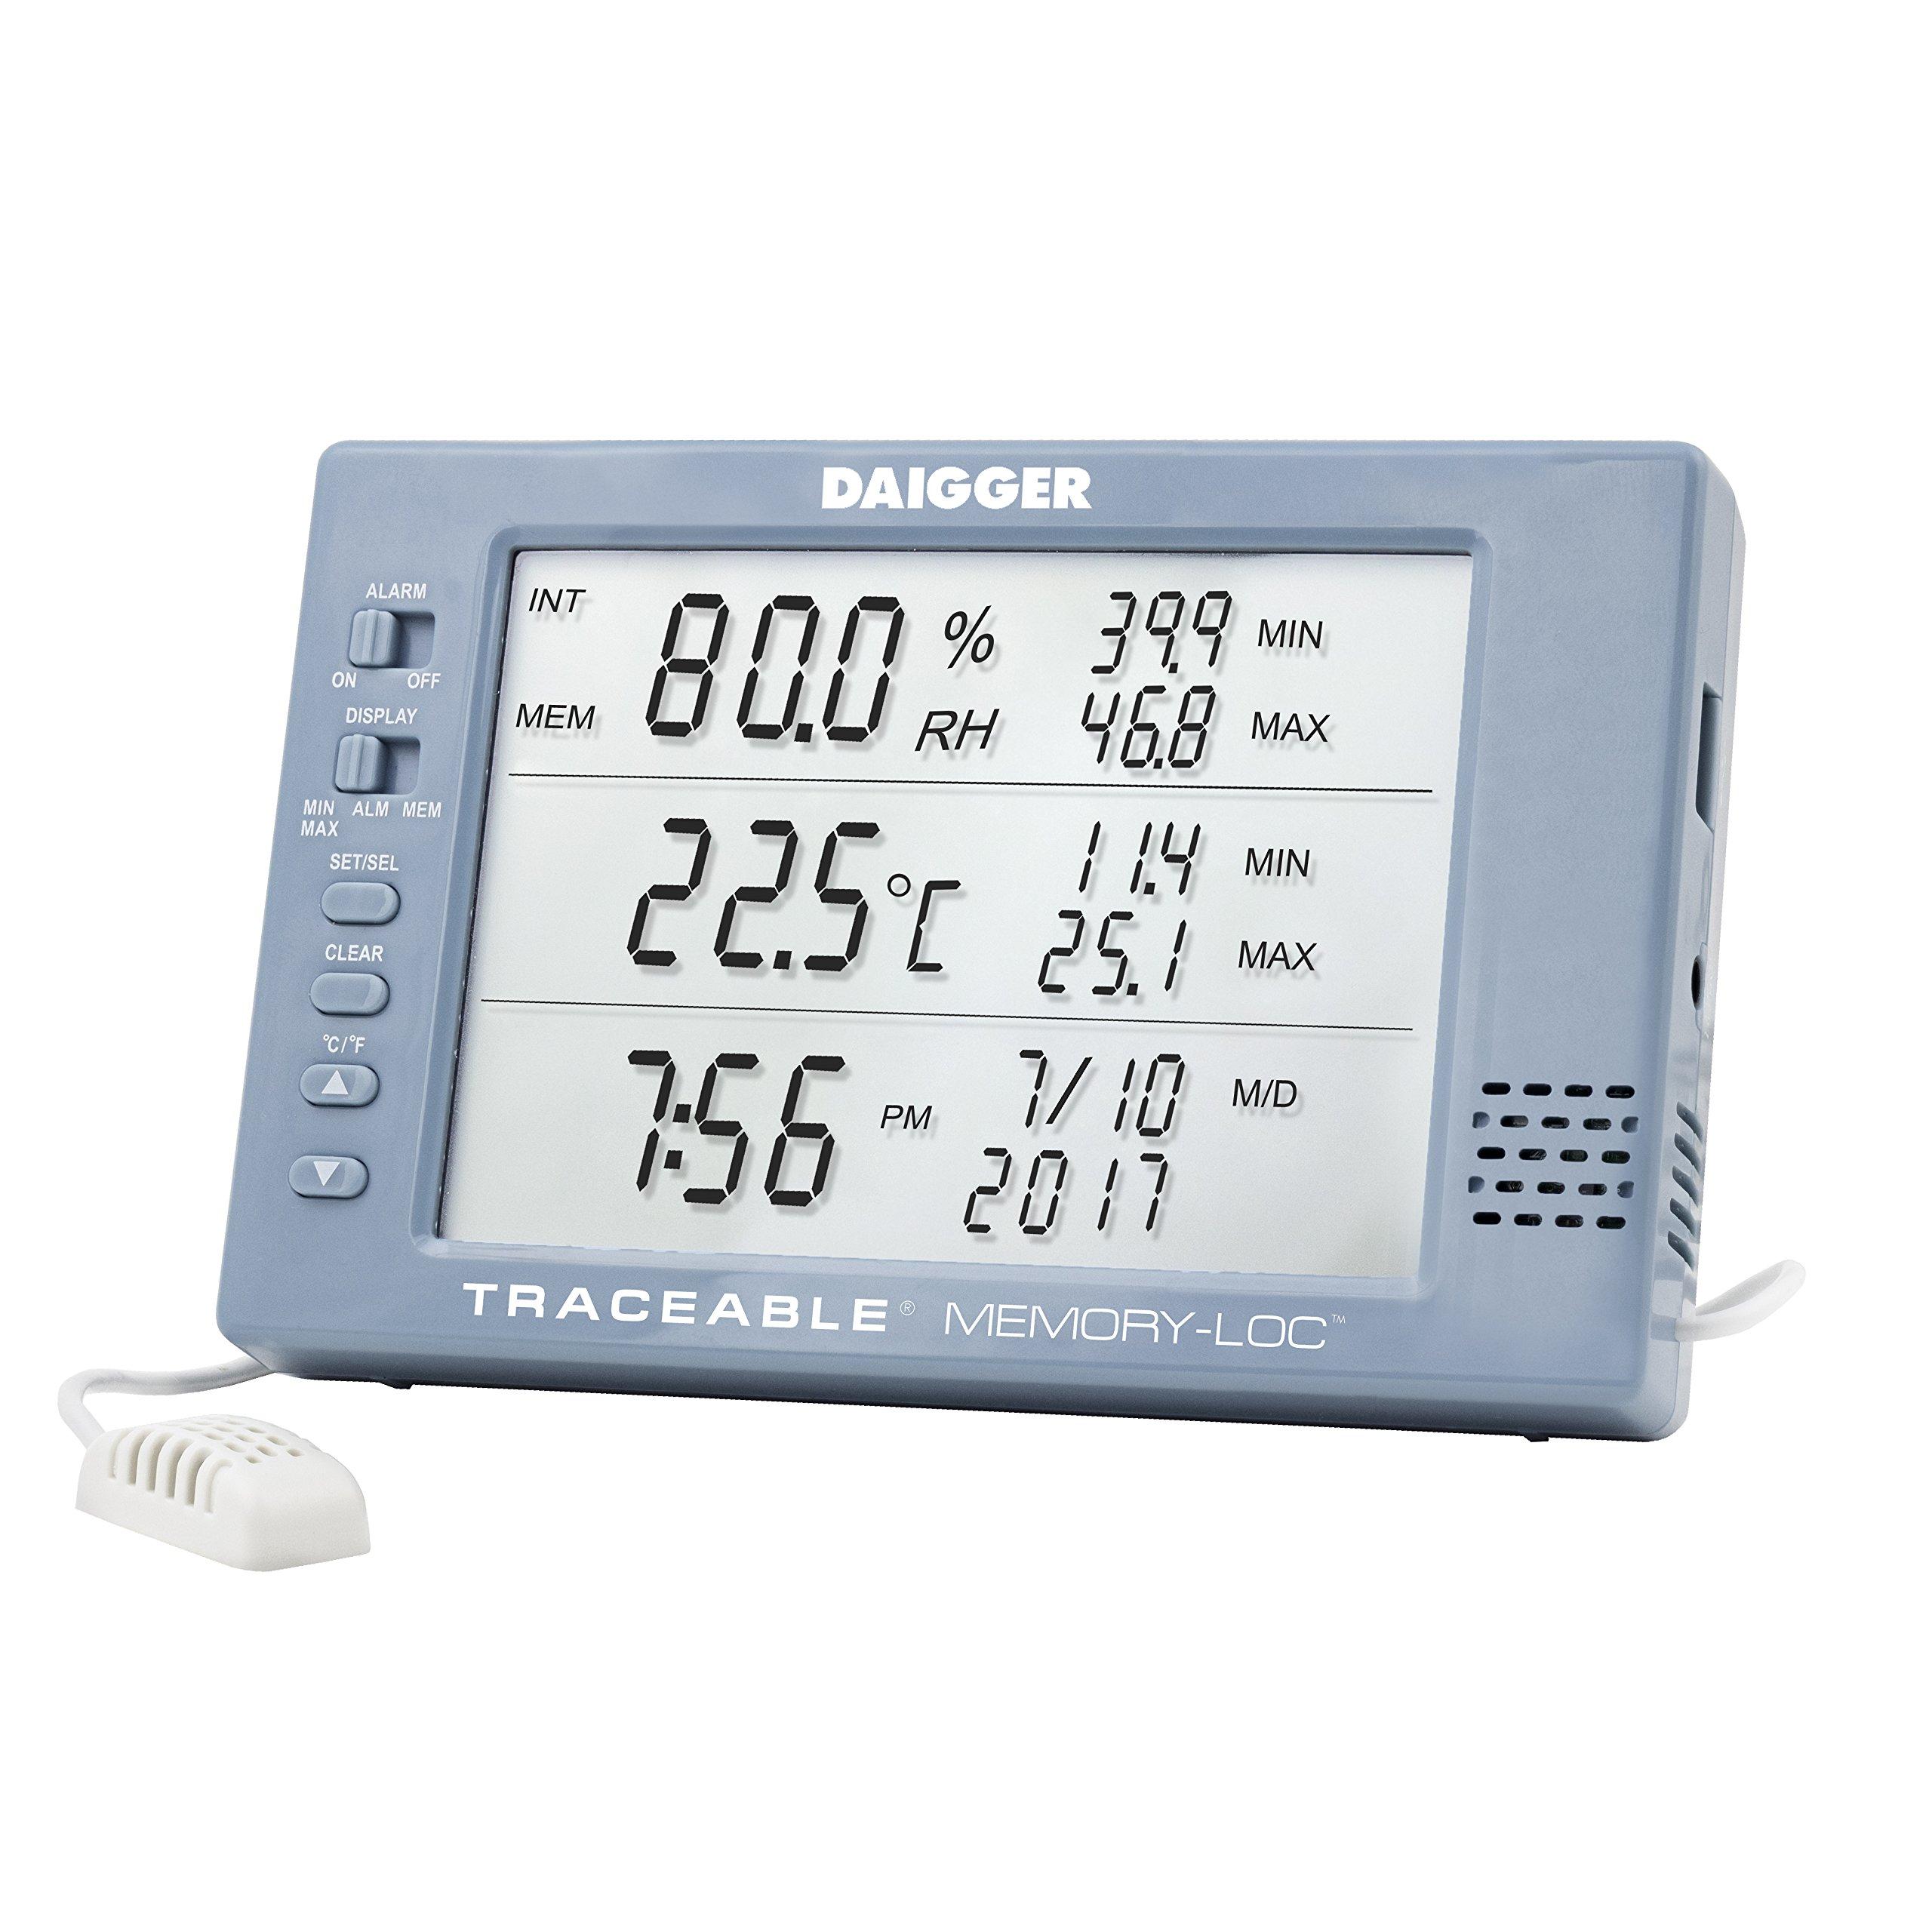 Daigger Traceable Excursion-Trac Datalogging Barometer